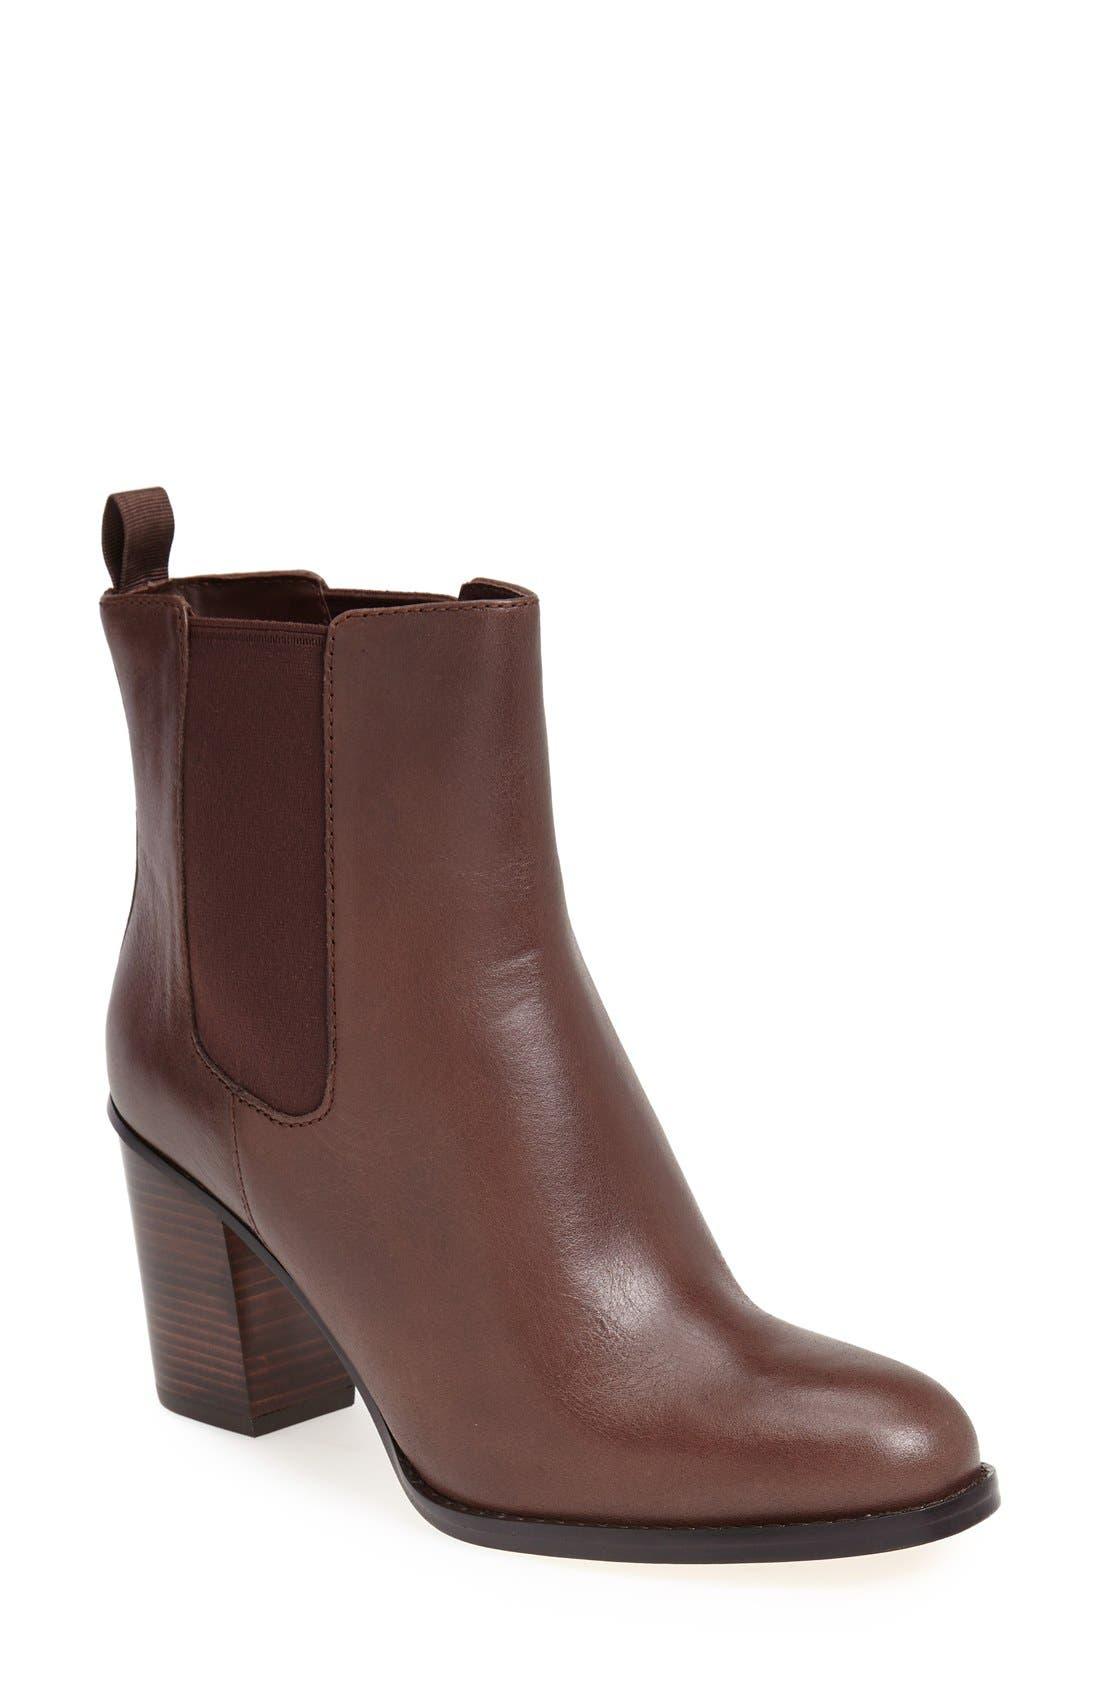 Main Image - Cole Haan 'Draven' Chelsea Boot (Women)